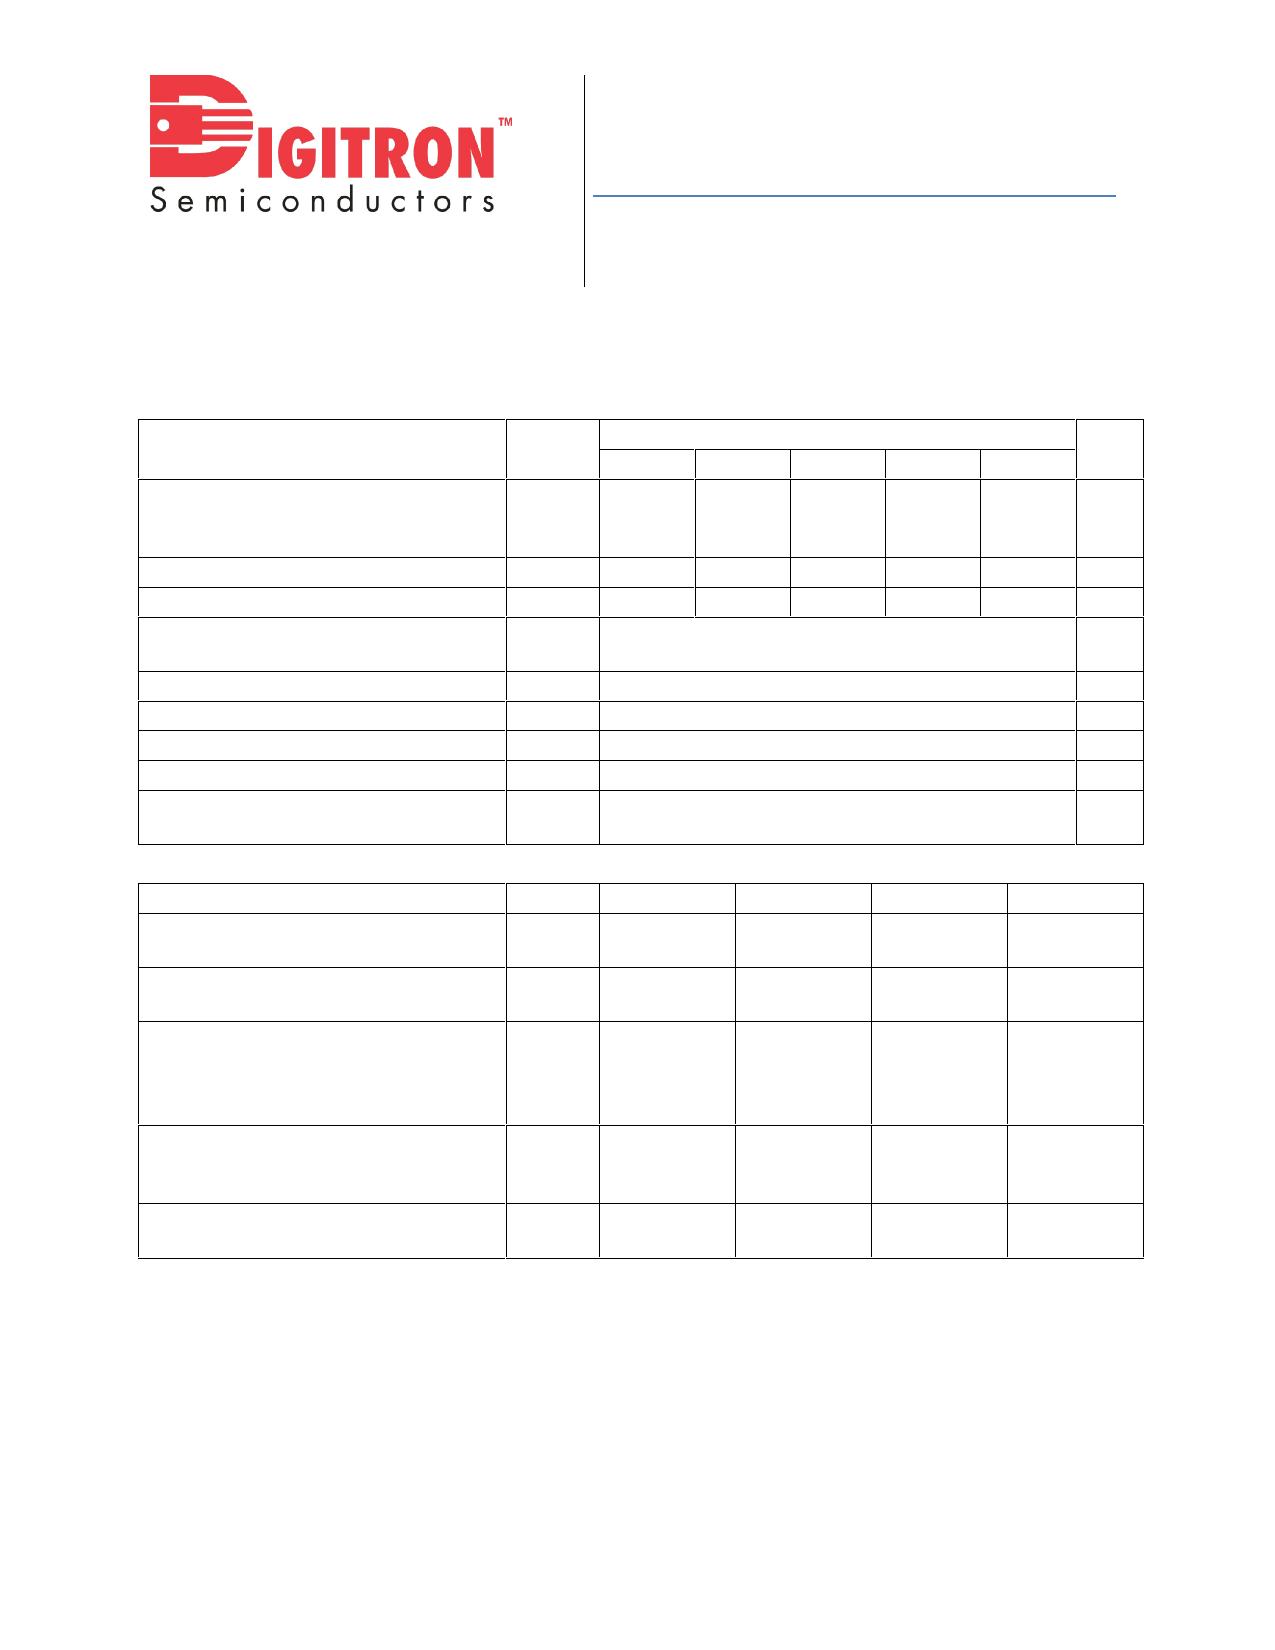 MR2400F 데이터시트 및 MR2400F PDF